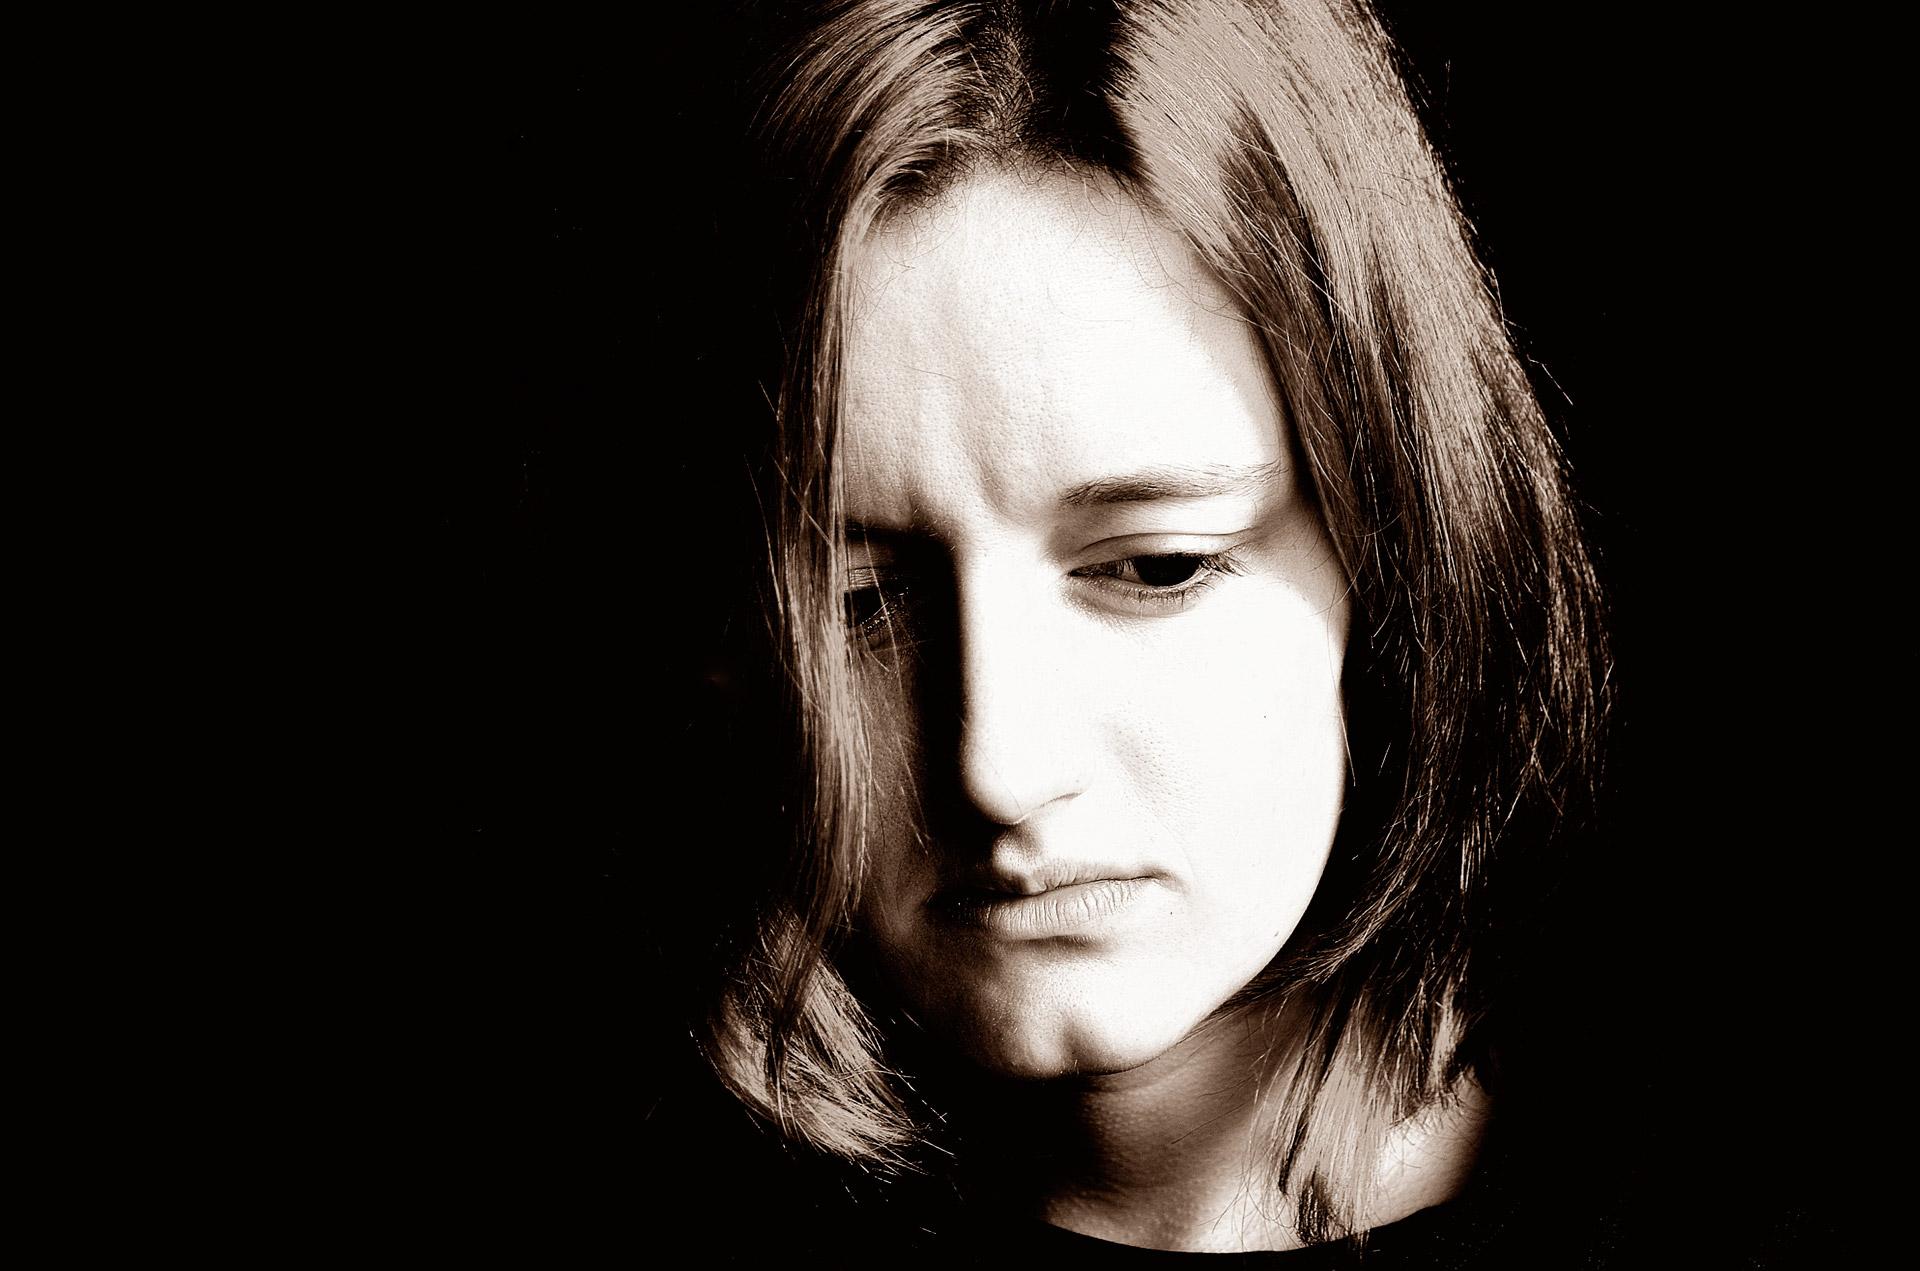 Sad_Woman.jpg (1920×1271)